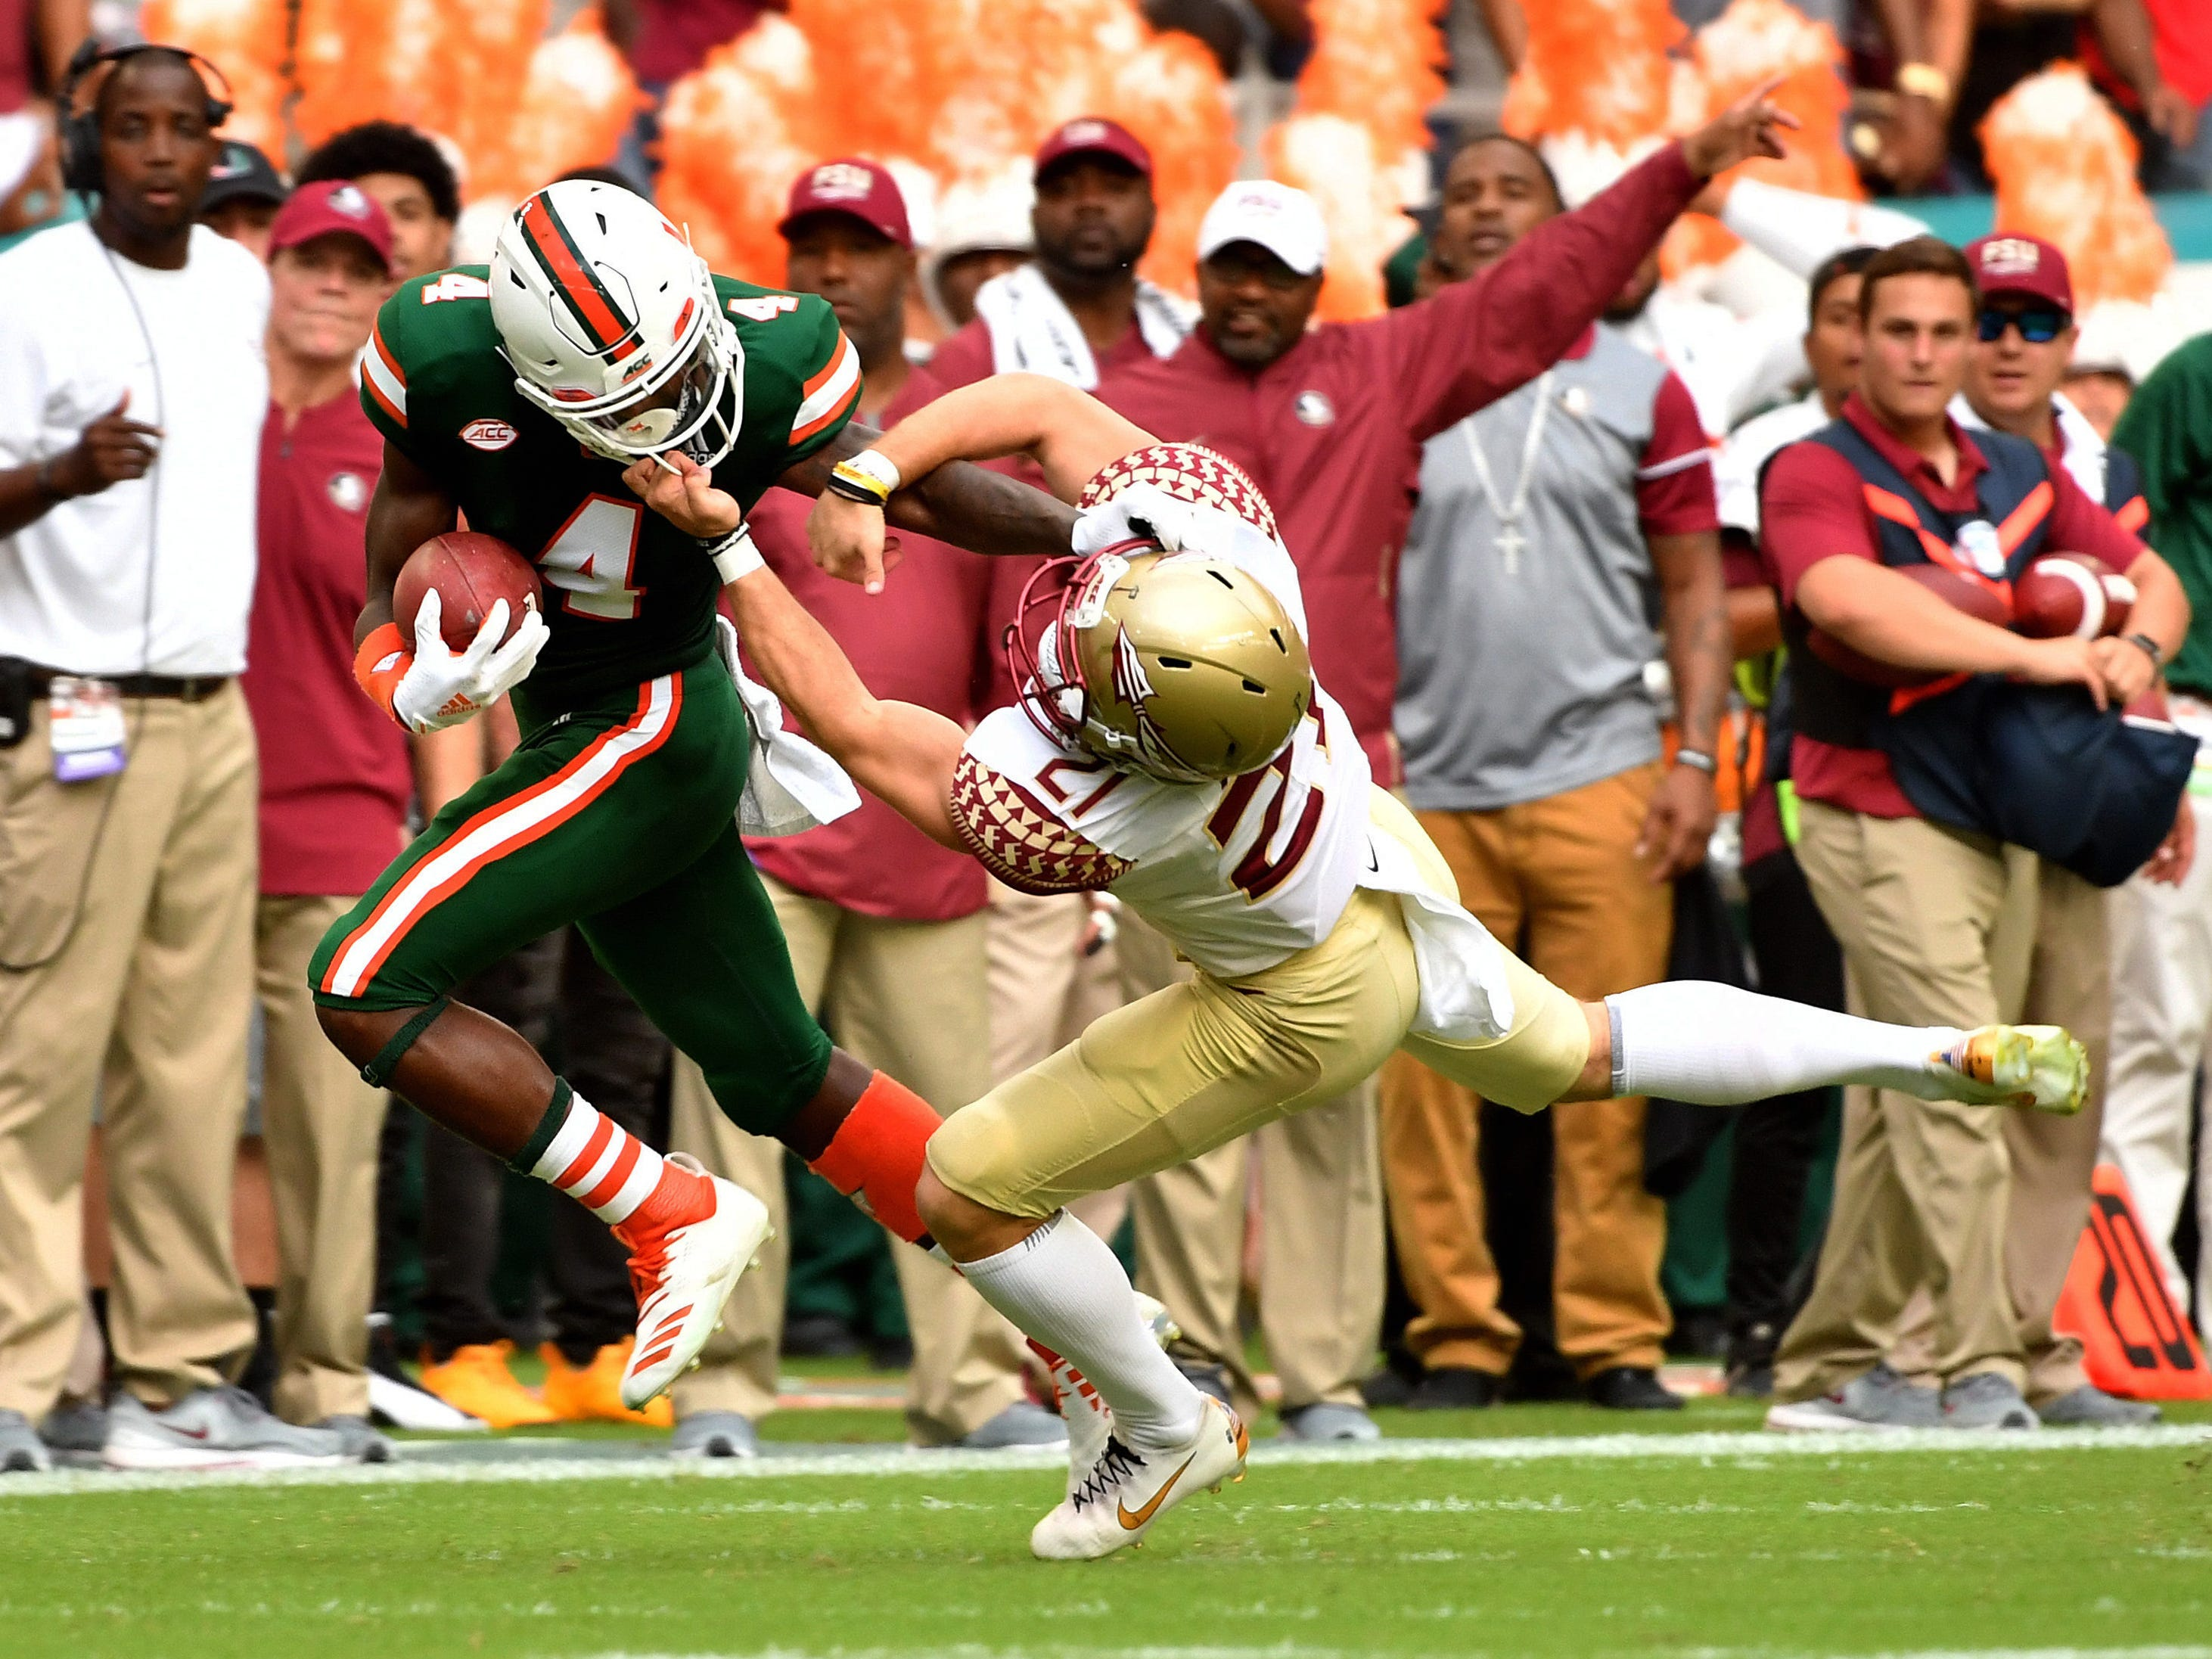 Florida State Seminoles punter Logan Tyler pulls on the facemask of Miami Hurricanes wide receiver Jeff Thomas during the first half at Hard Rock Stadium.